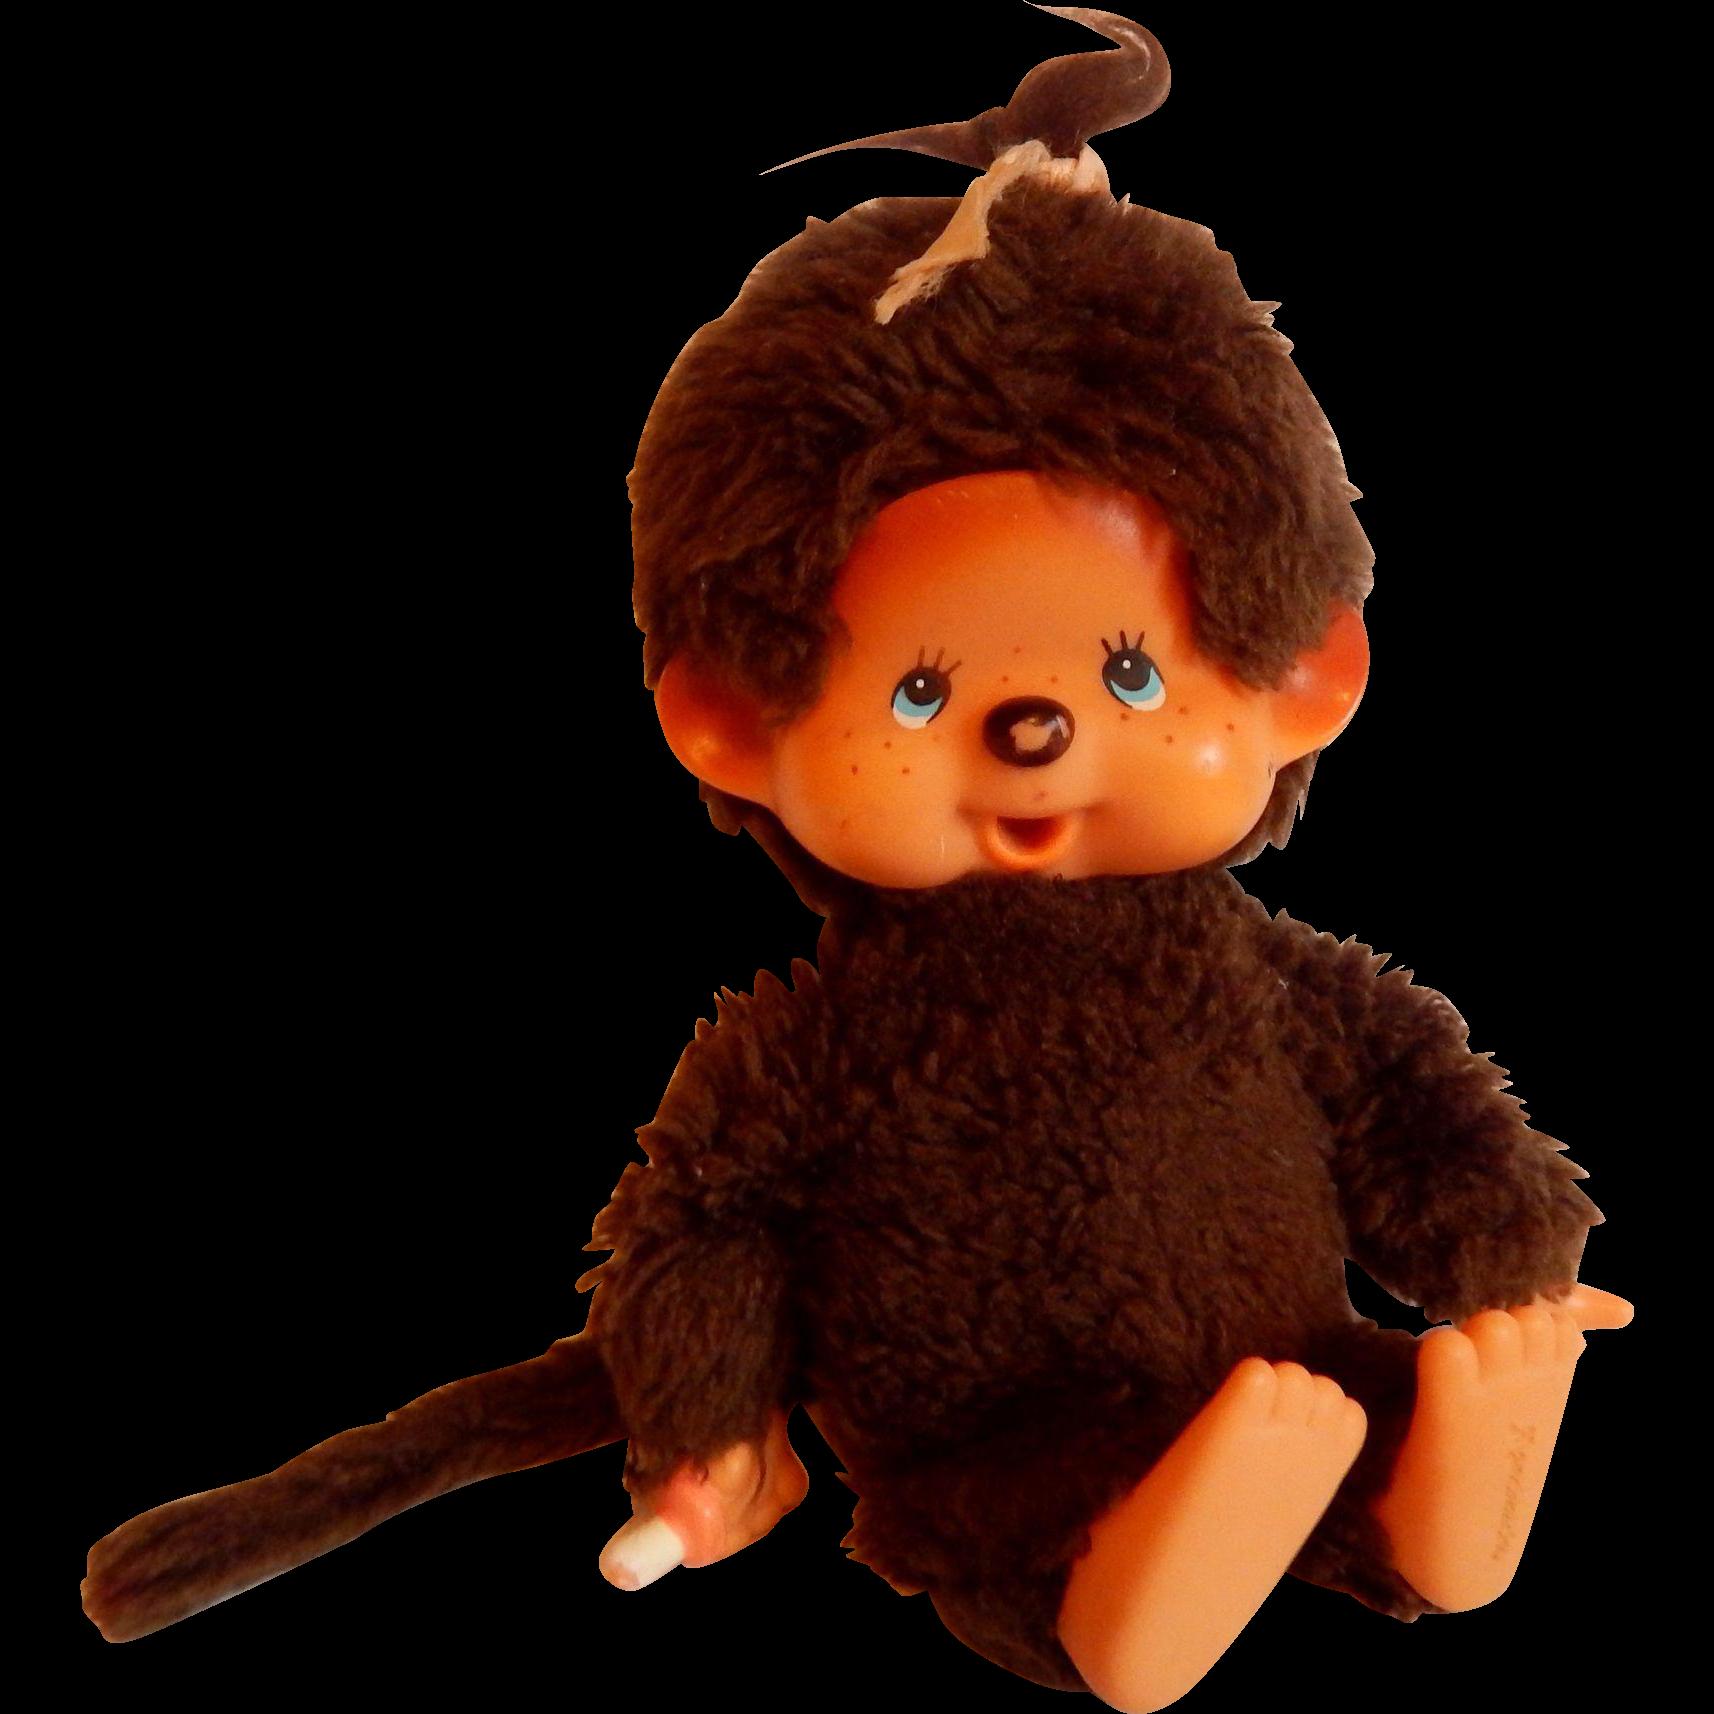 Sekiguchi Mattel Monchhichi Plush Toy